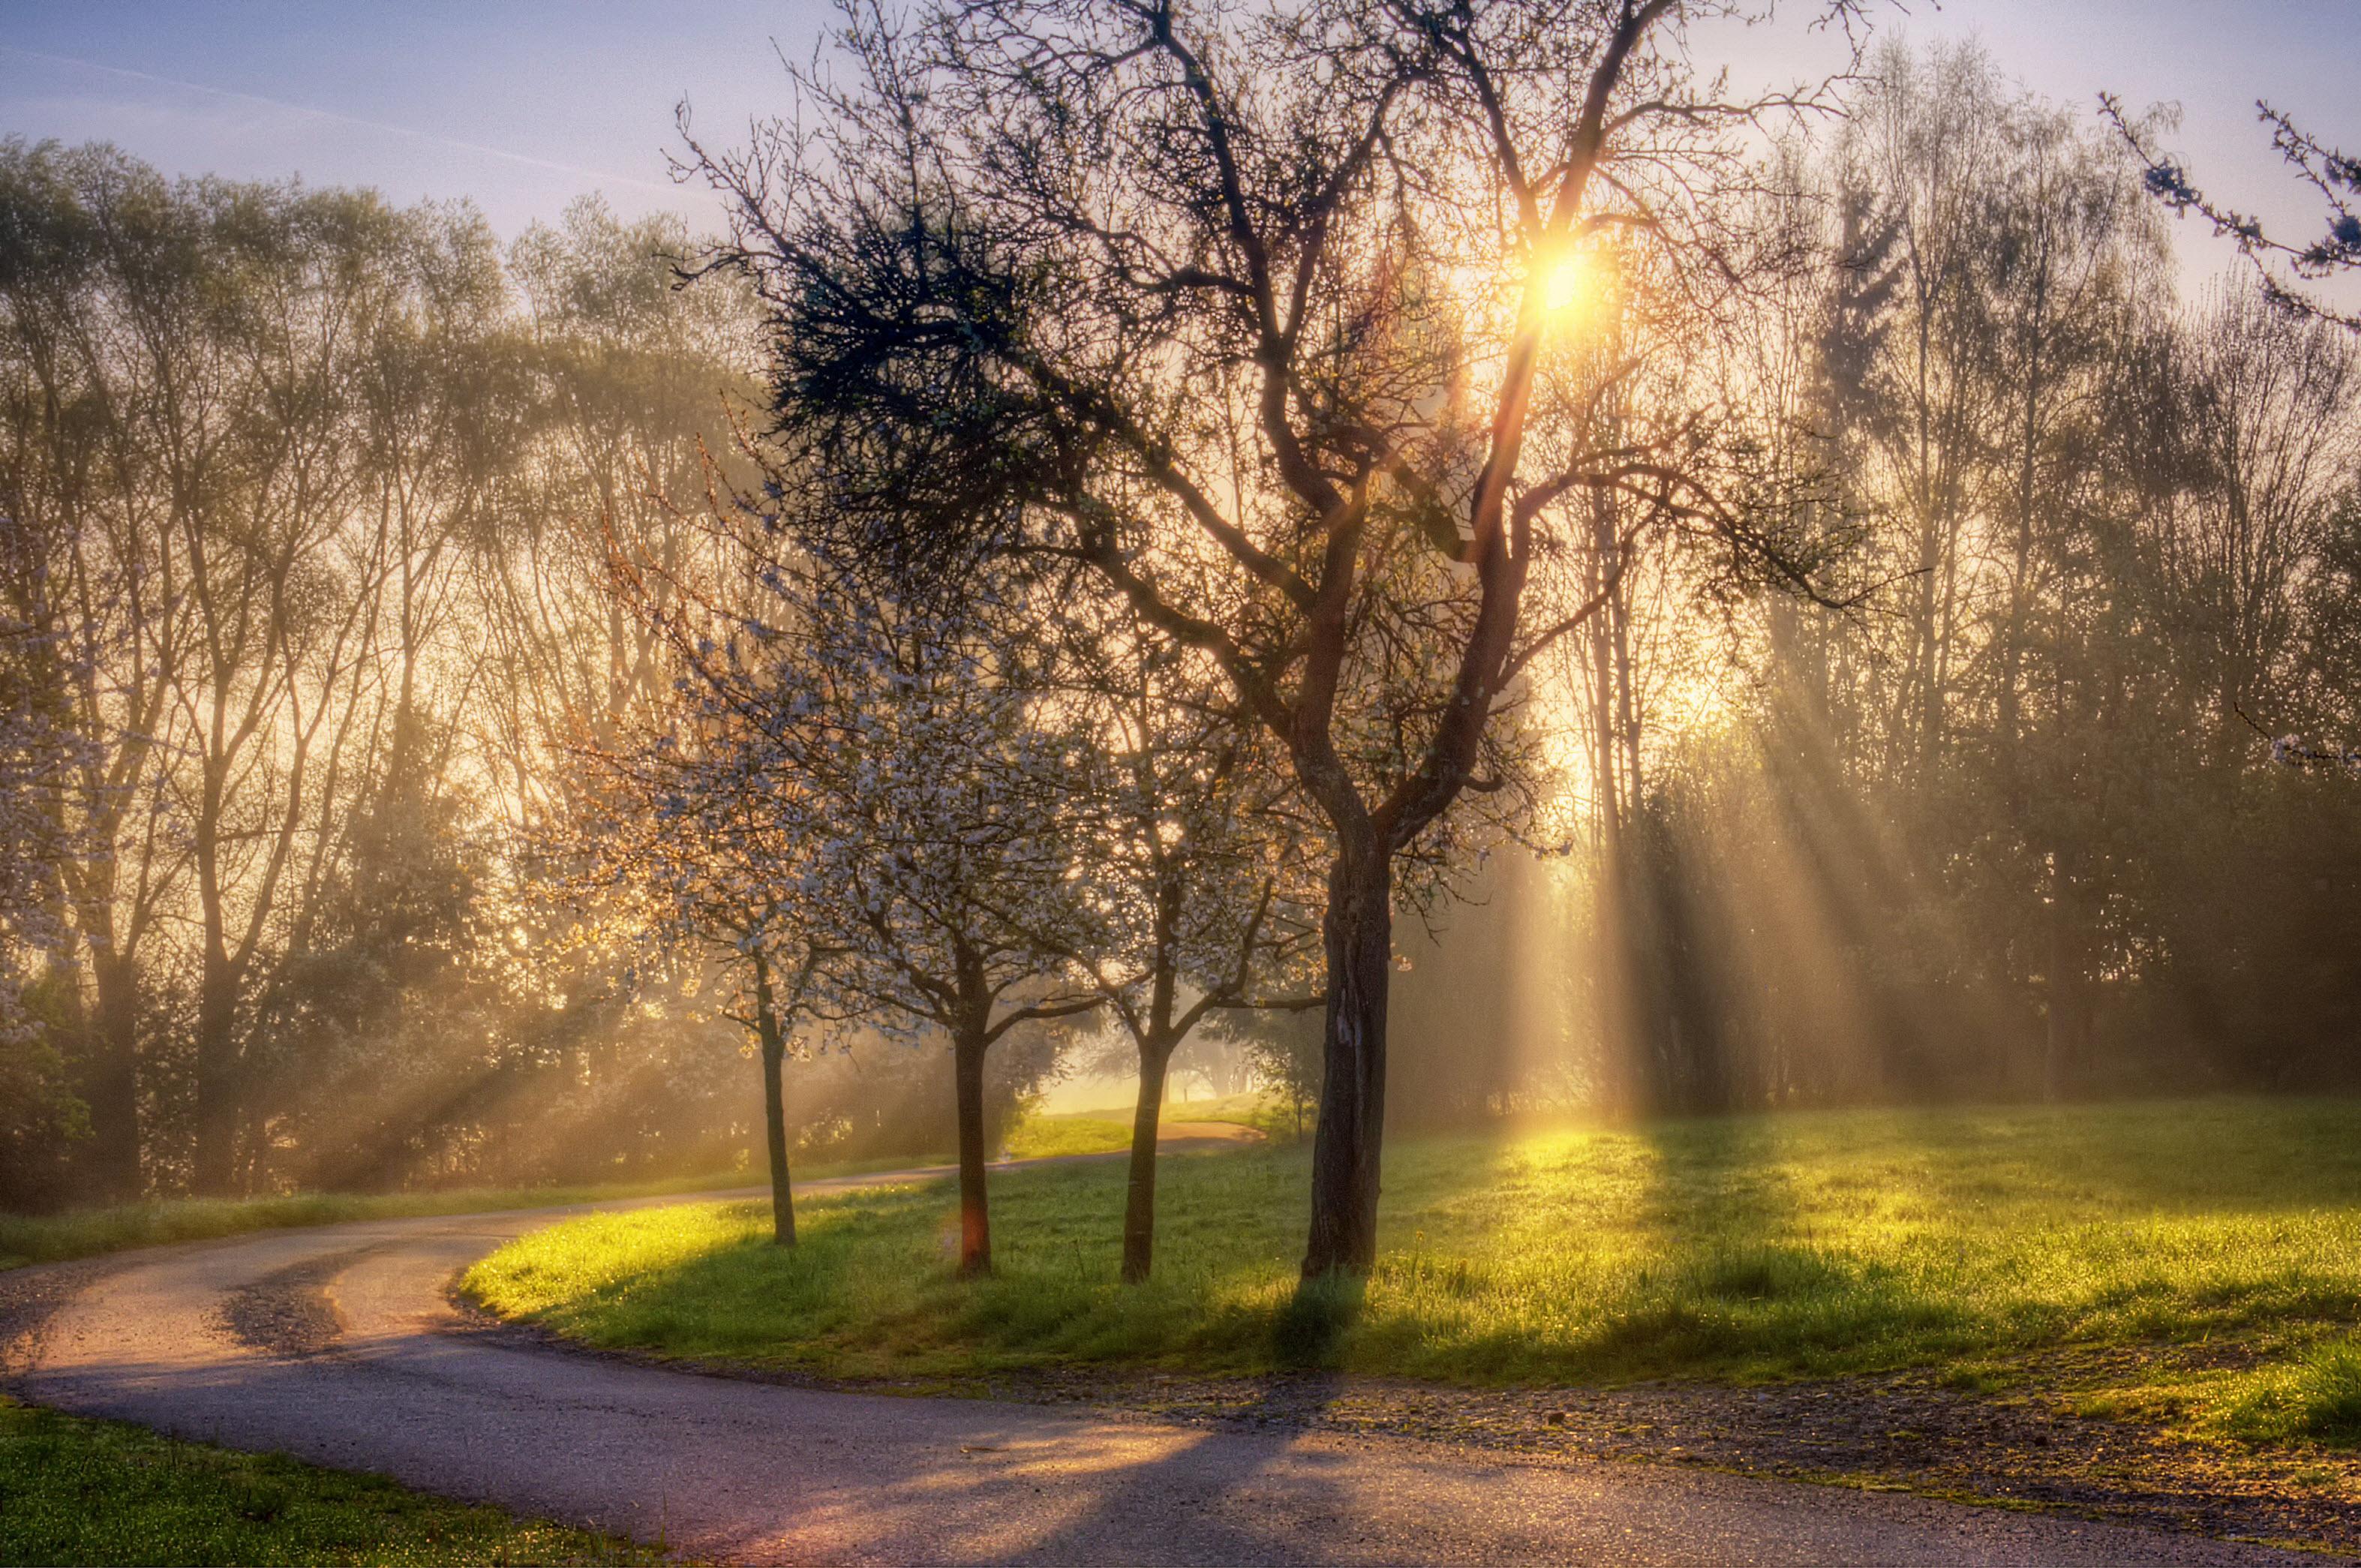 Free Computer Wallpaper Fall Leaves Sun Shining Through Trees Nature